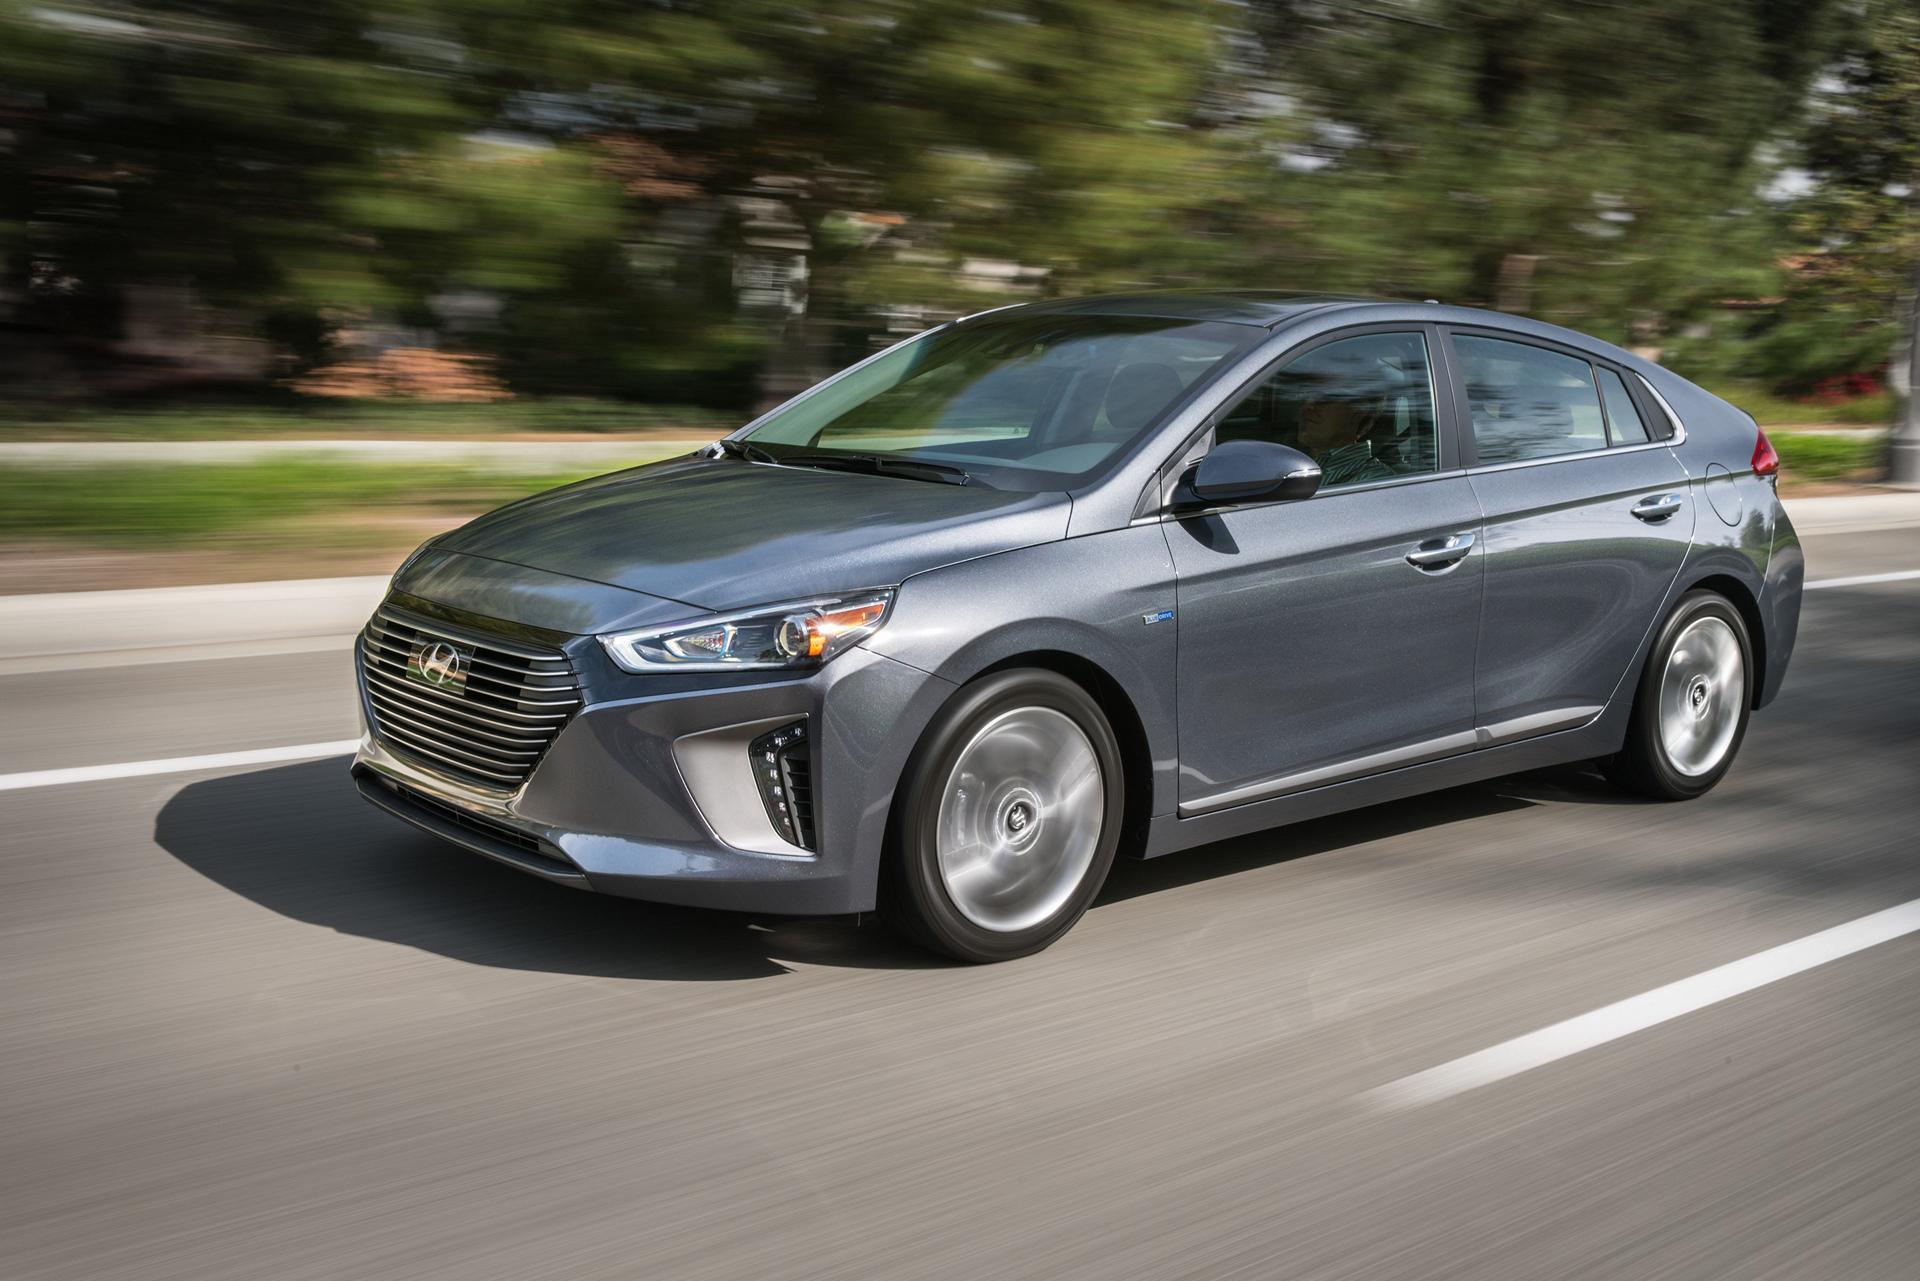 2017 Hyundai IONIQ Hybrid © Hyundai Motor Company